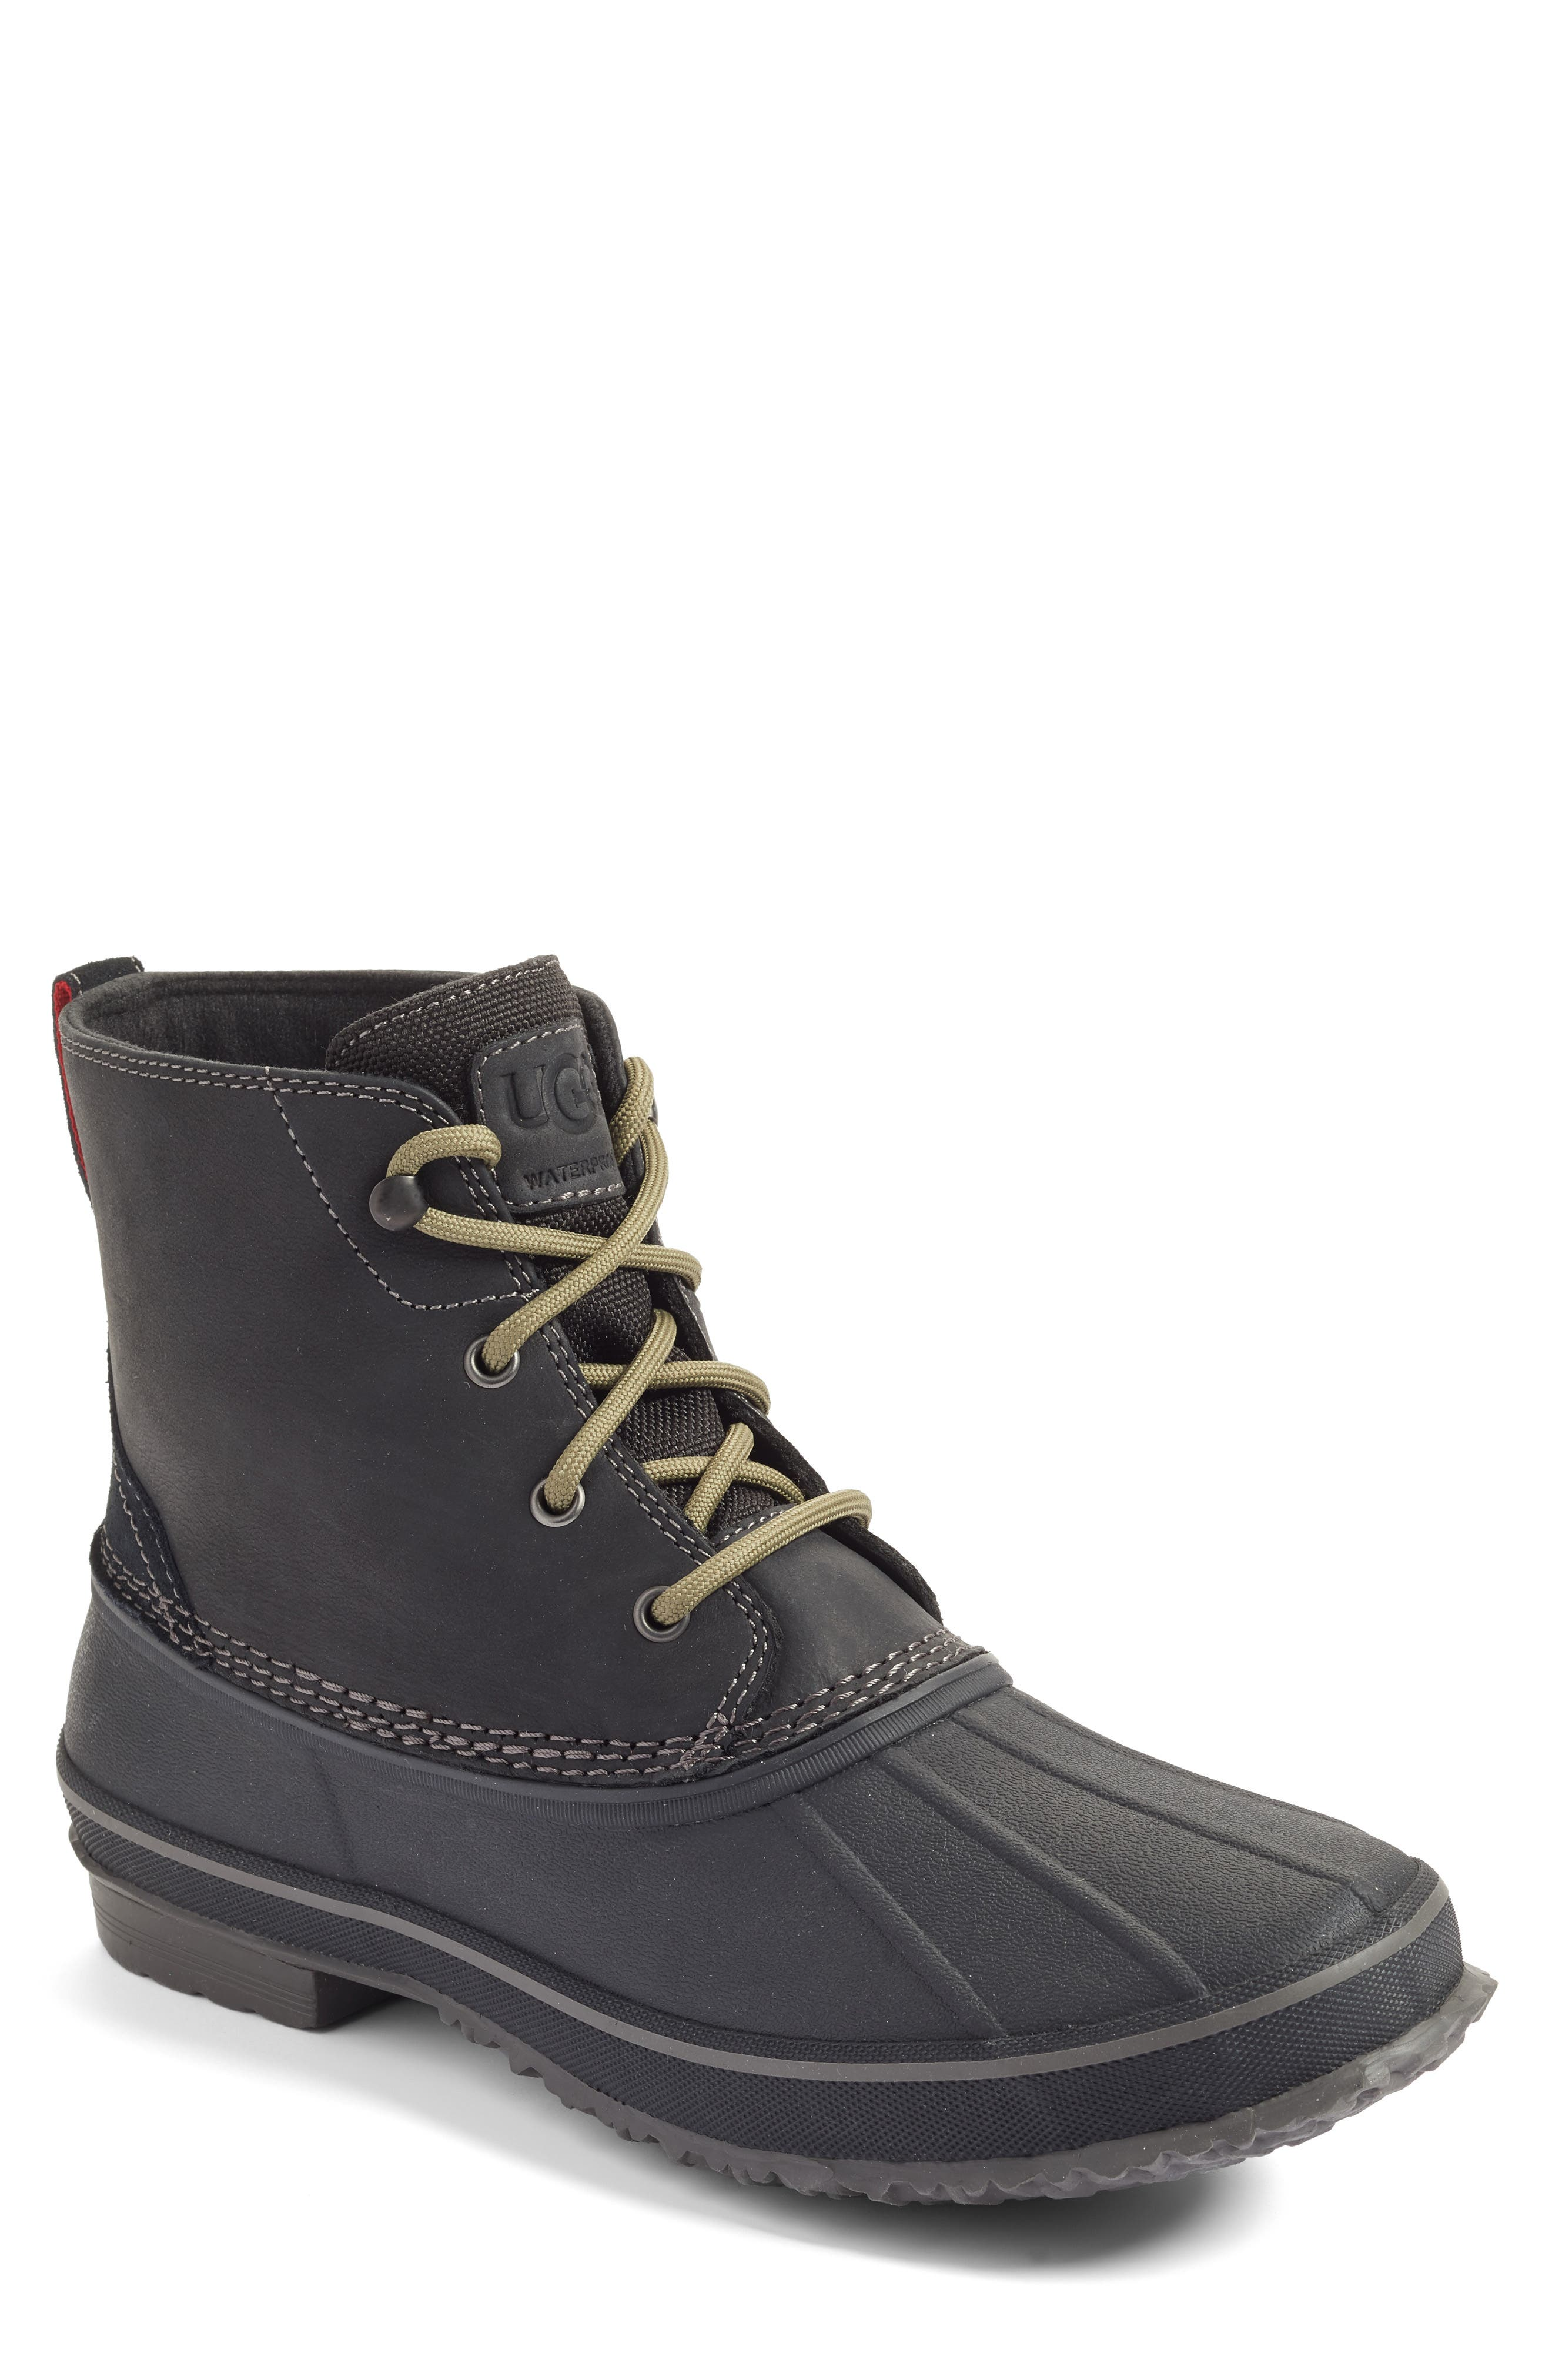 Ugg Zetik Waterproof Rain Boot- Black